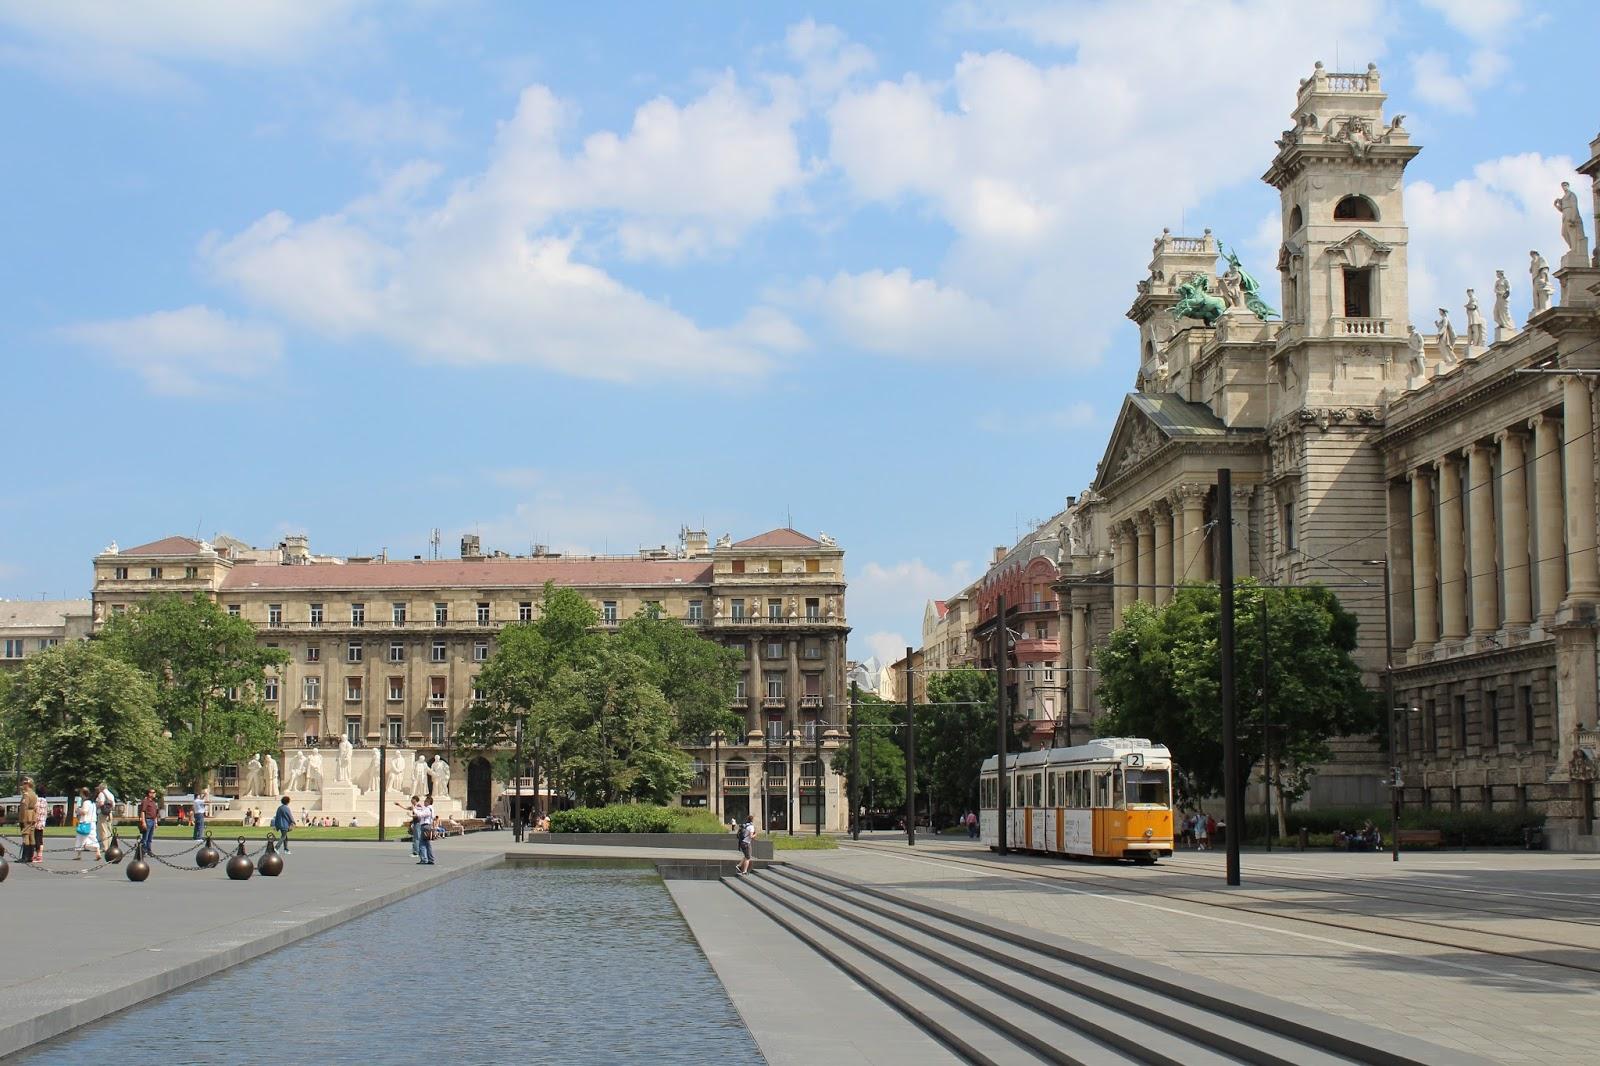 Tram in Budapest